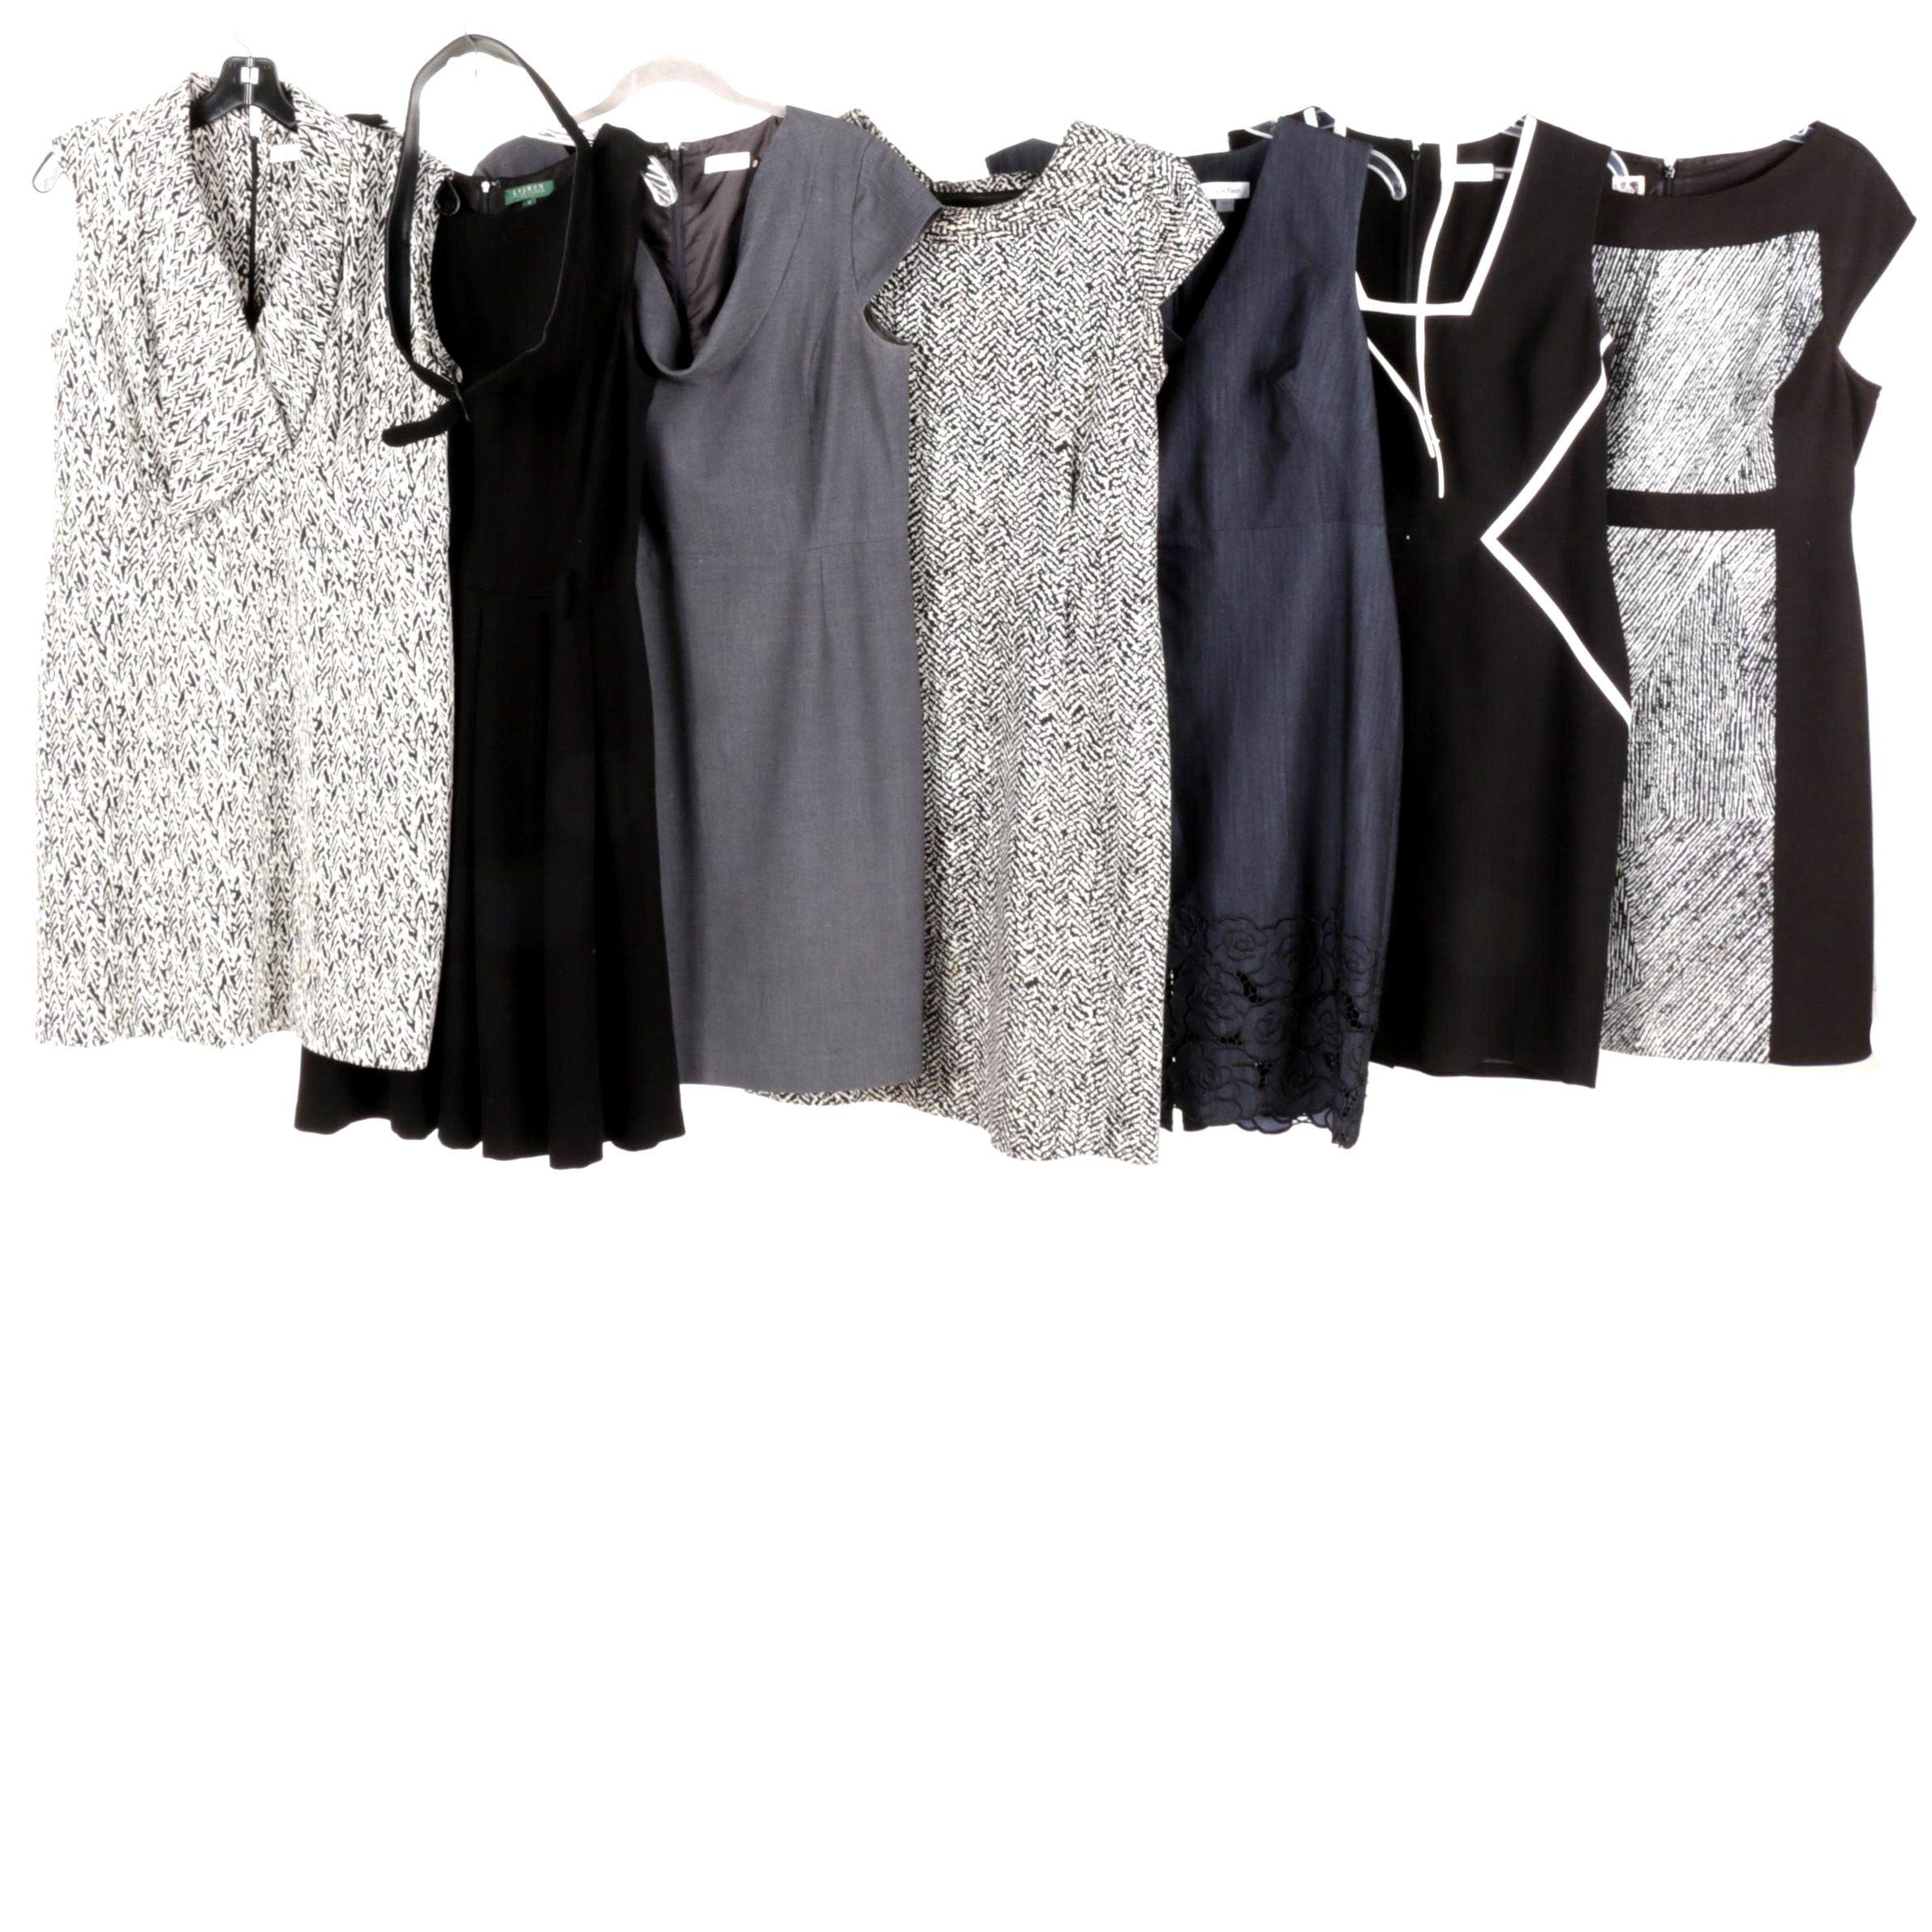 Dresses Including Calvin Klein